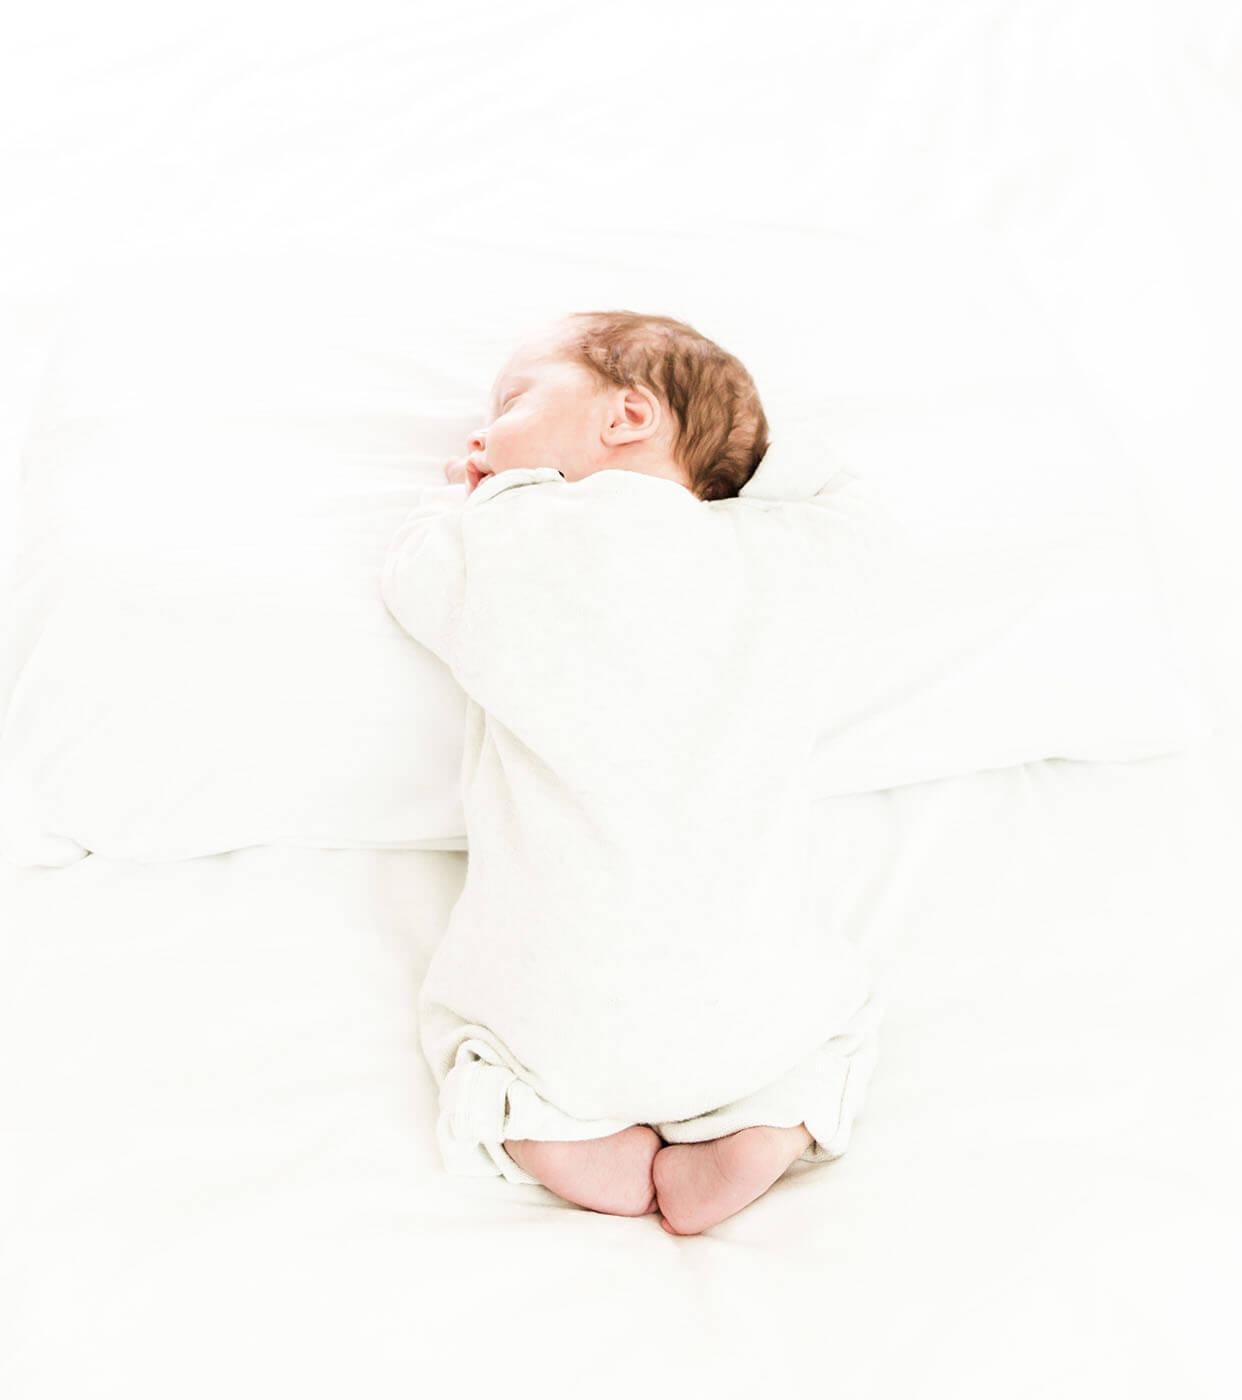 newborn fotograaf Zuidhorn, newborn fotograaf Groningen, newborn fotografie Zuidhorn, newborn fotografie Groningen, baby shoot Zuidhorn, baby shoot Groningen, lijn 10